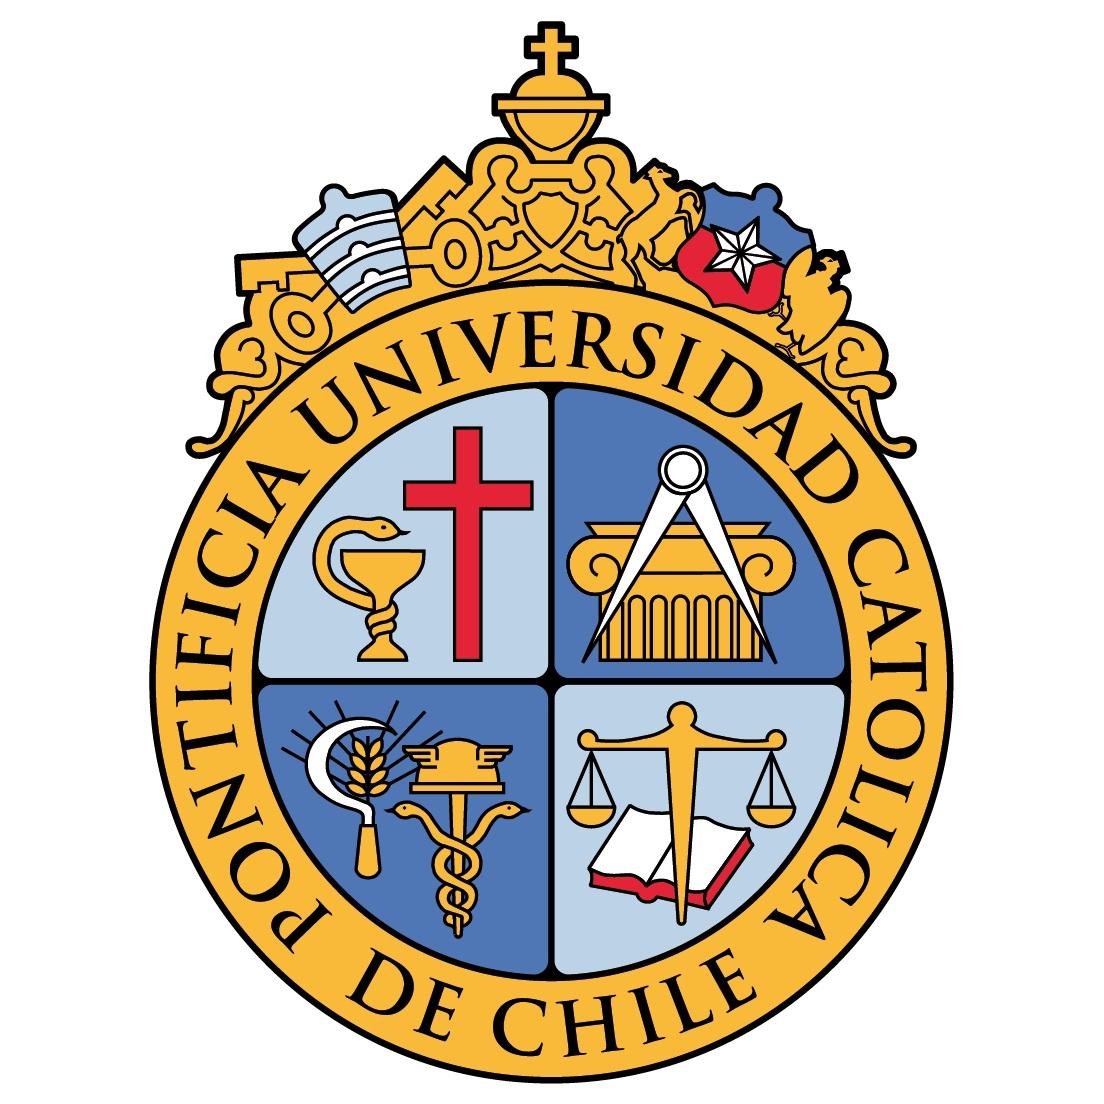 Mejores Universidades de Chile 2017: Pontificia Universidad Católica de Chile